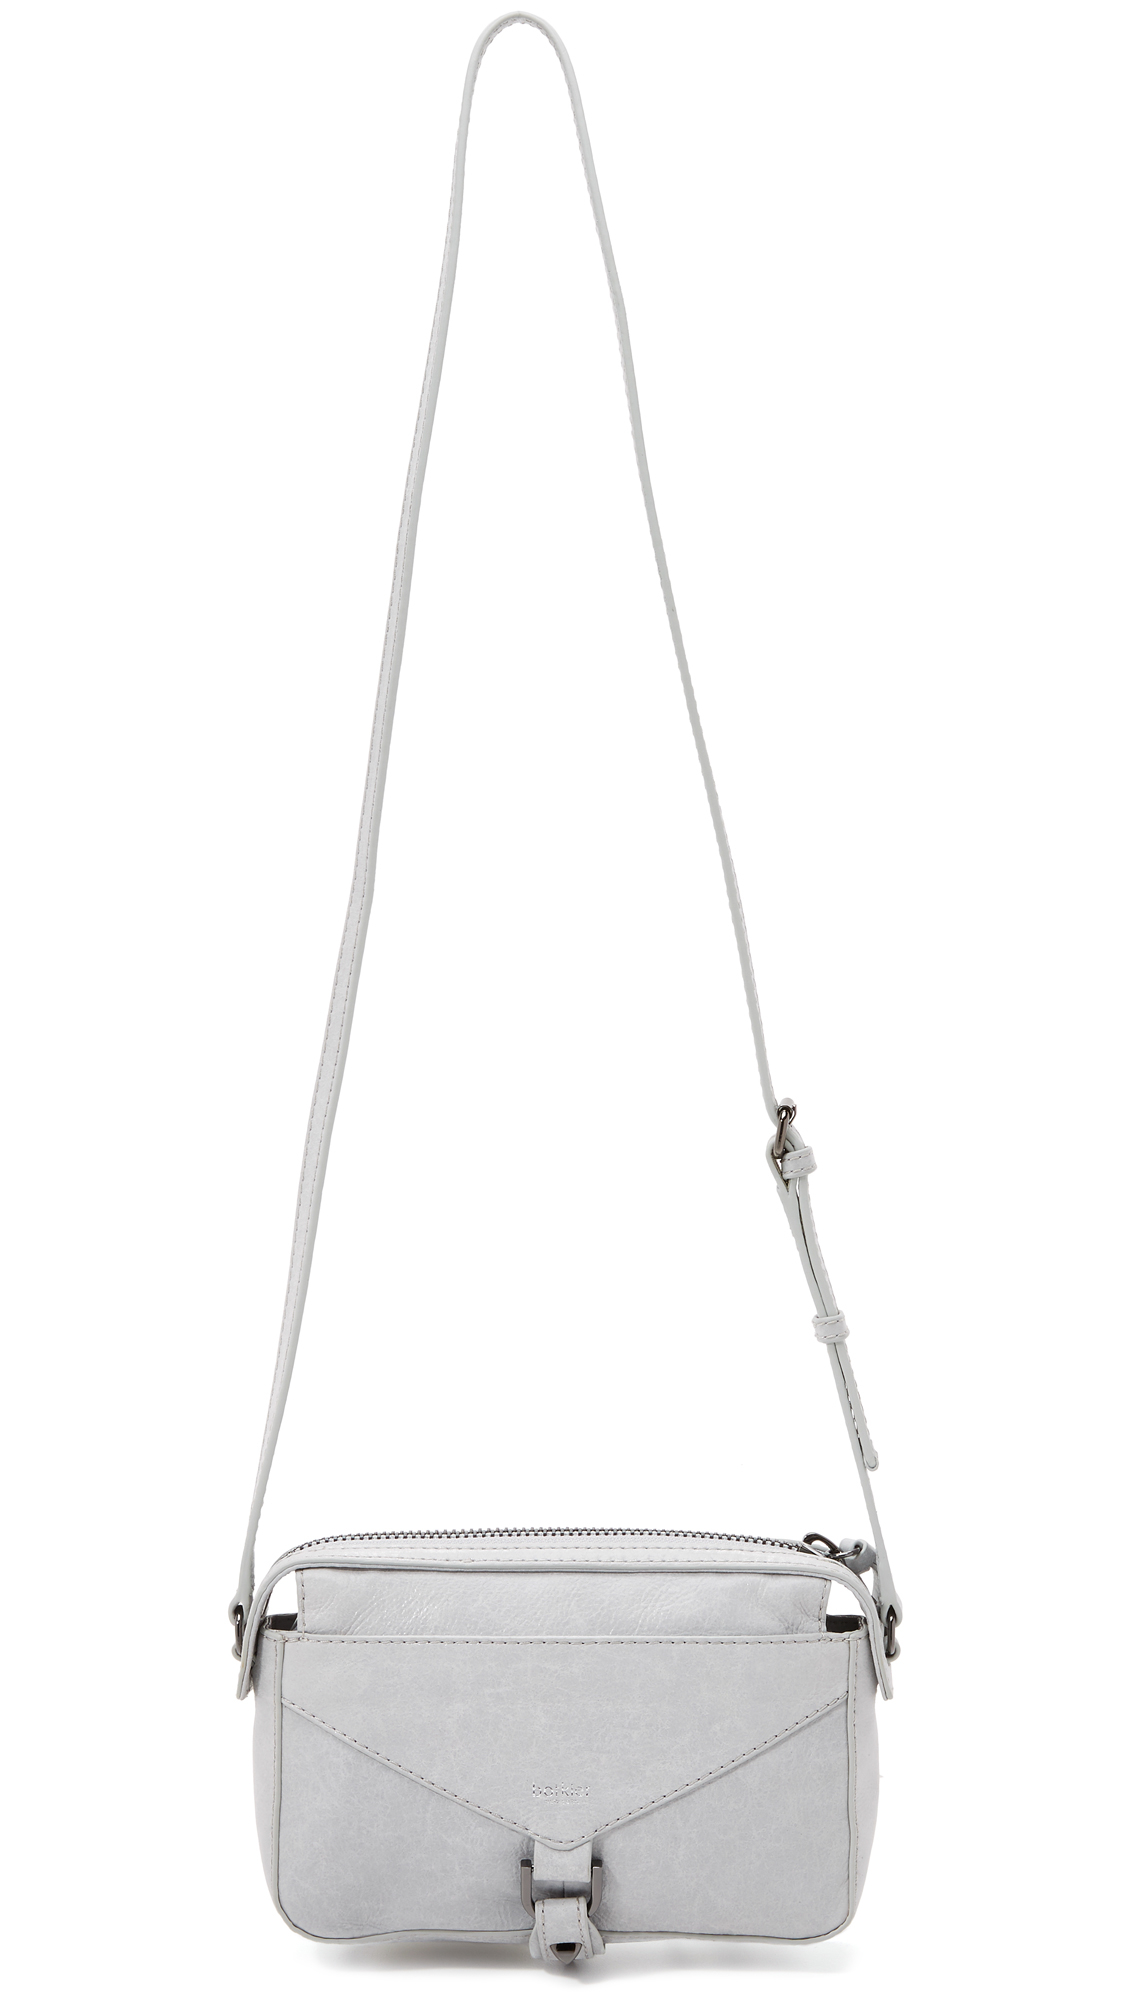 Botkier Leather Trigger East / West Cross Body Bag in Steel (Grey)